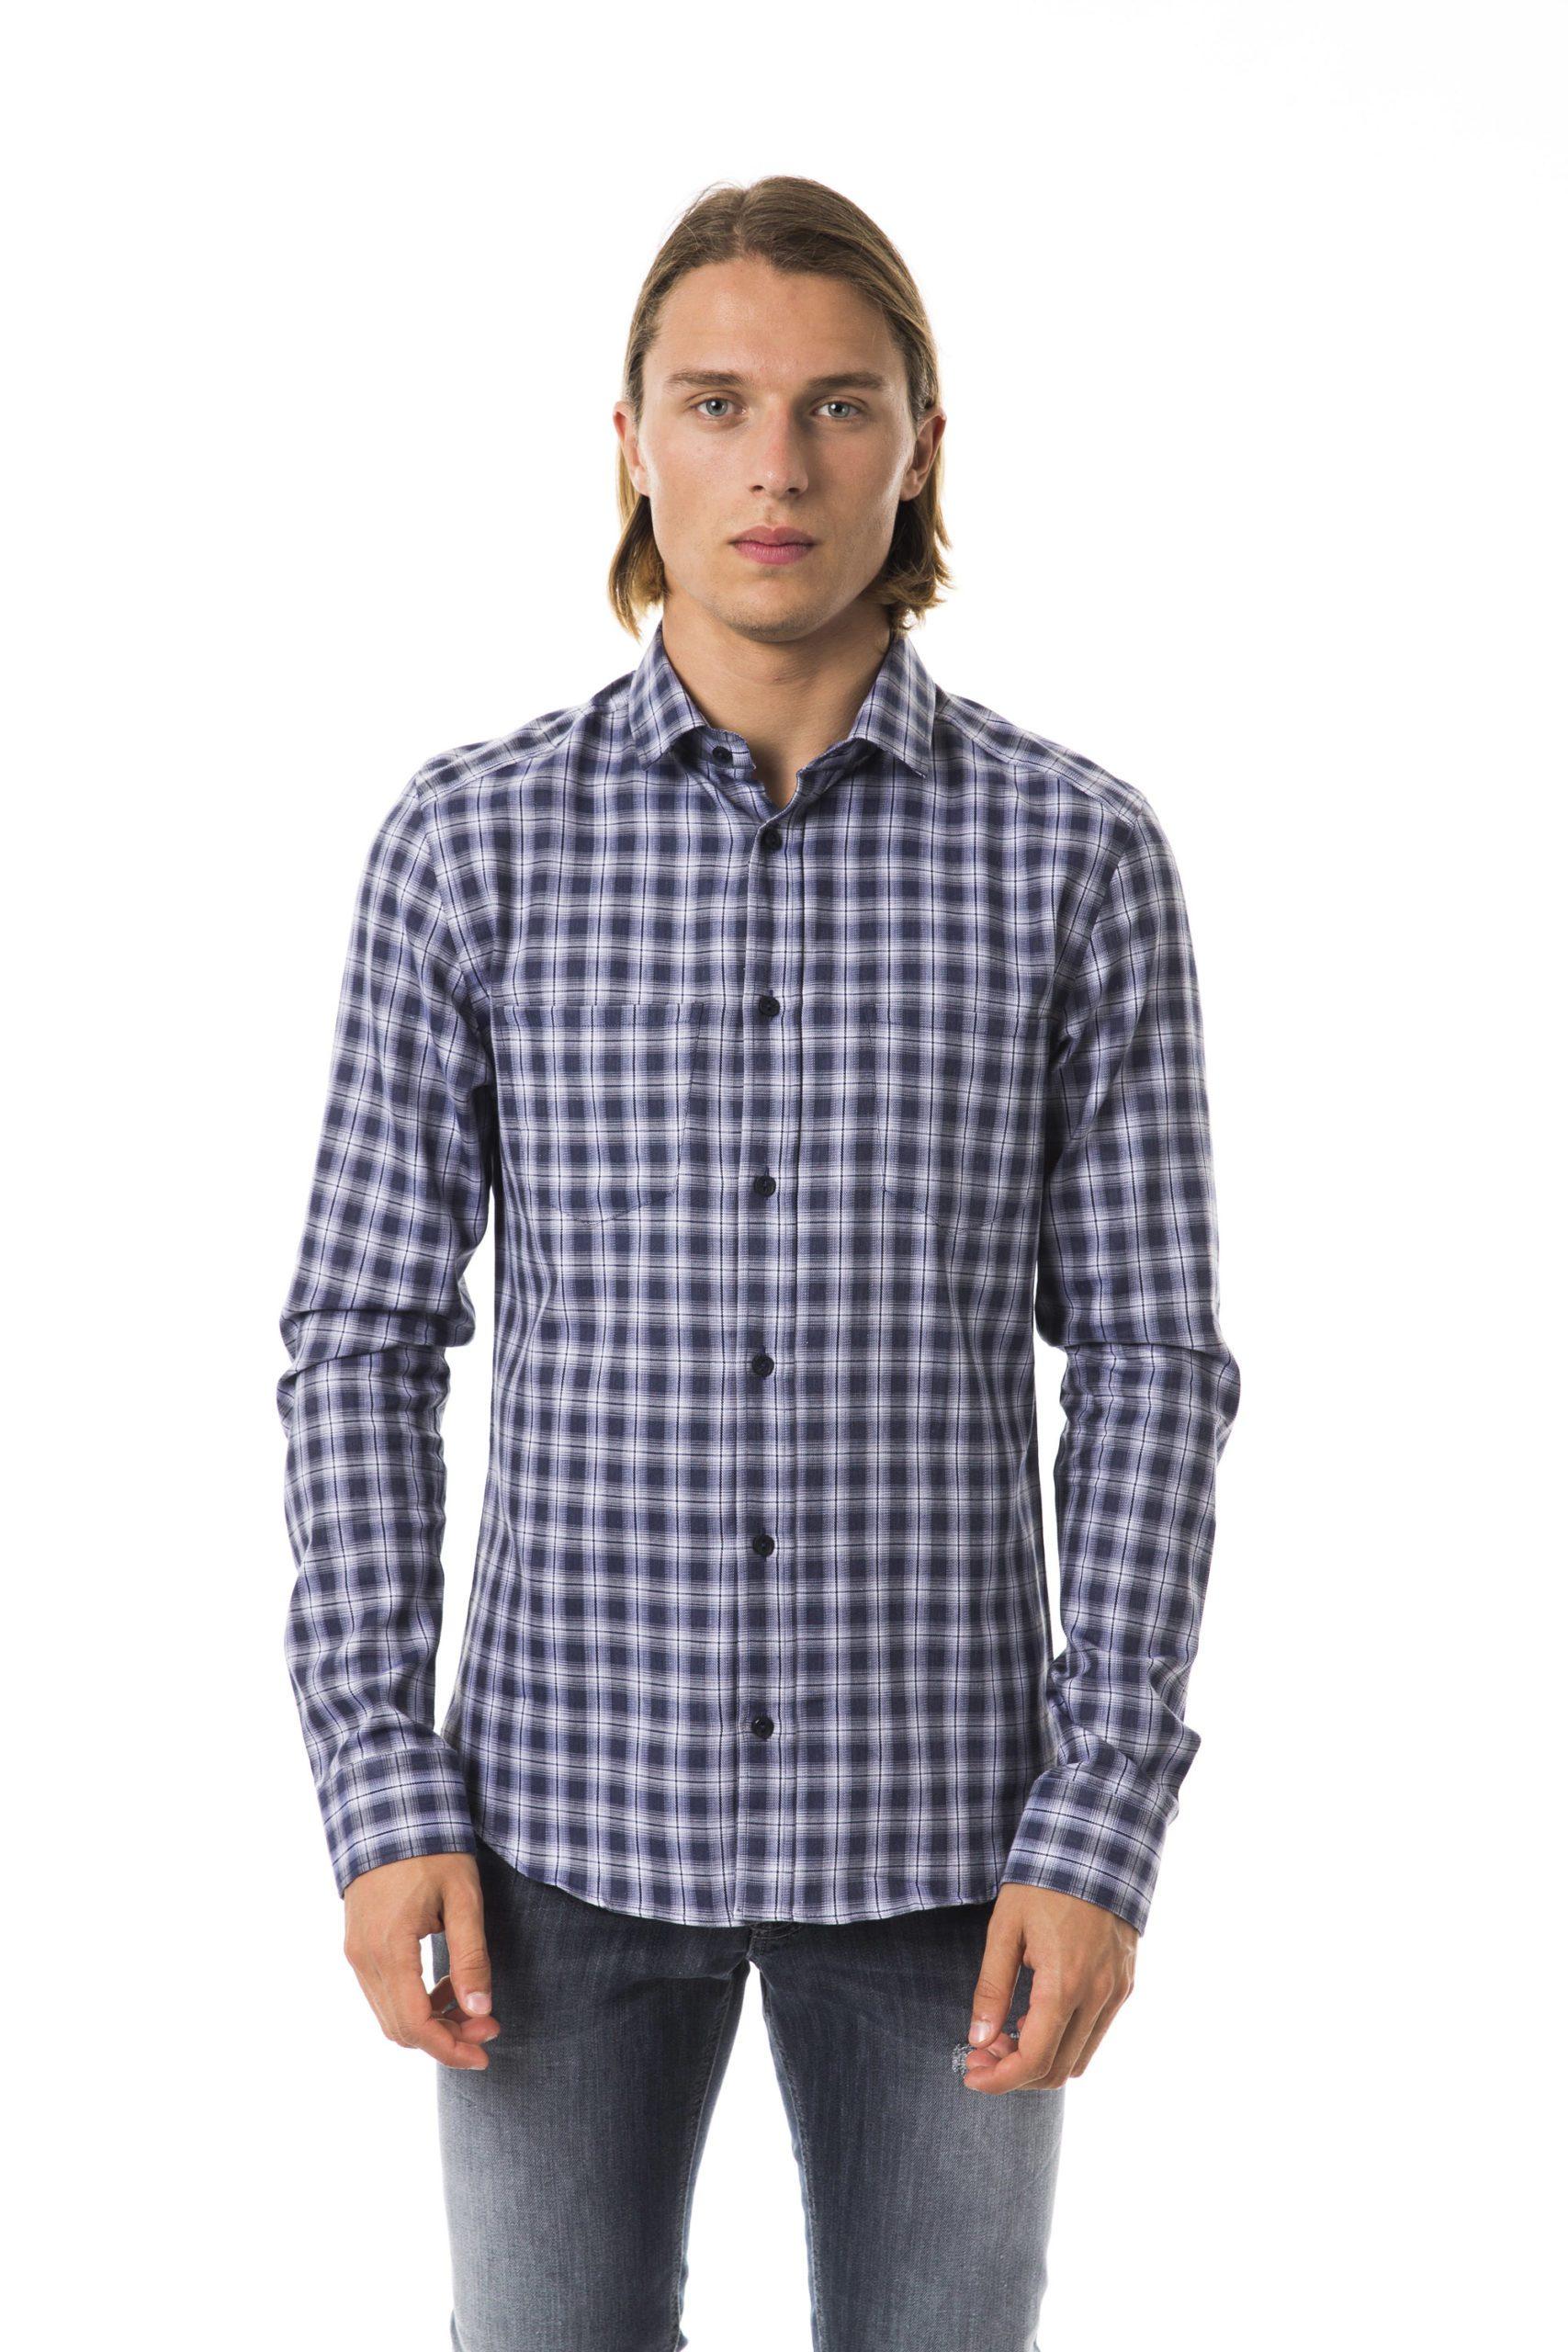 BYBLOS Men's Blu Shirt Blue BY1394839 - S